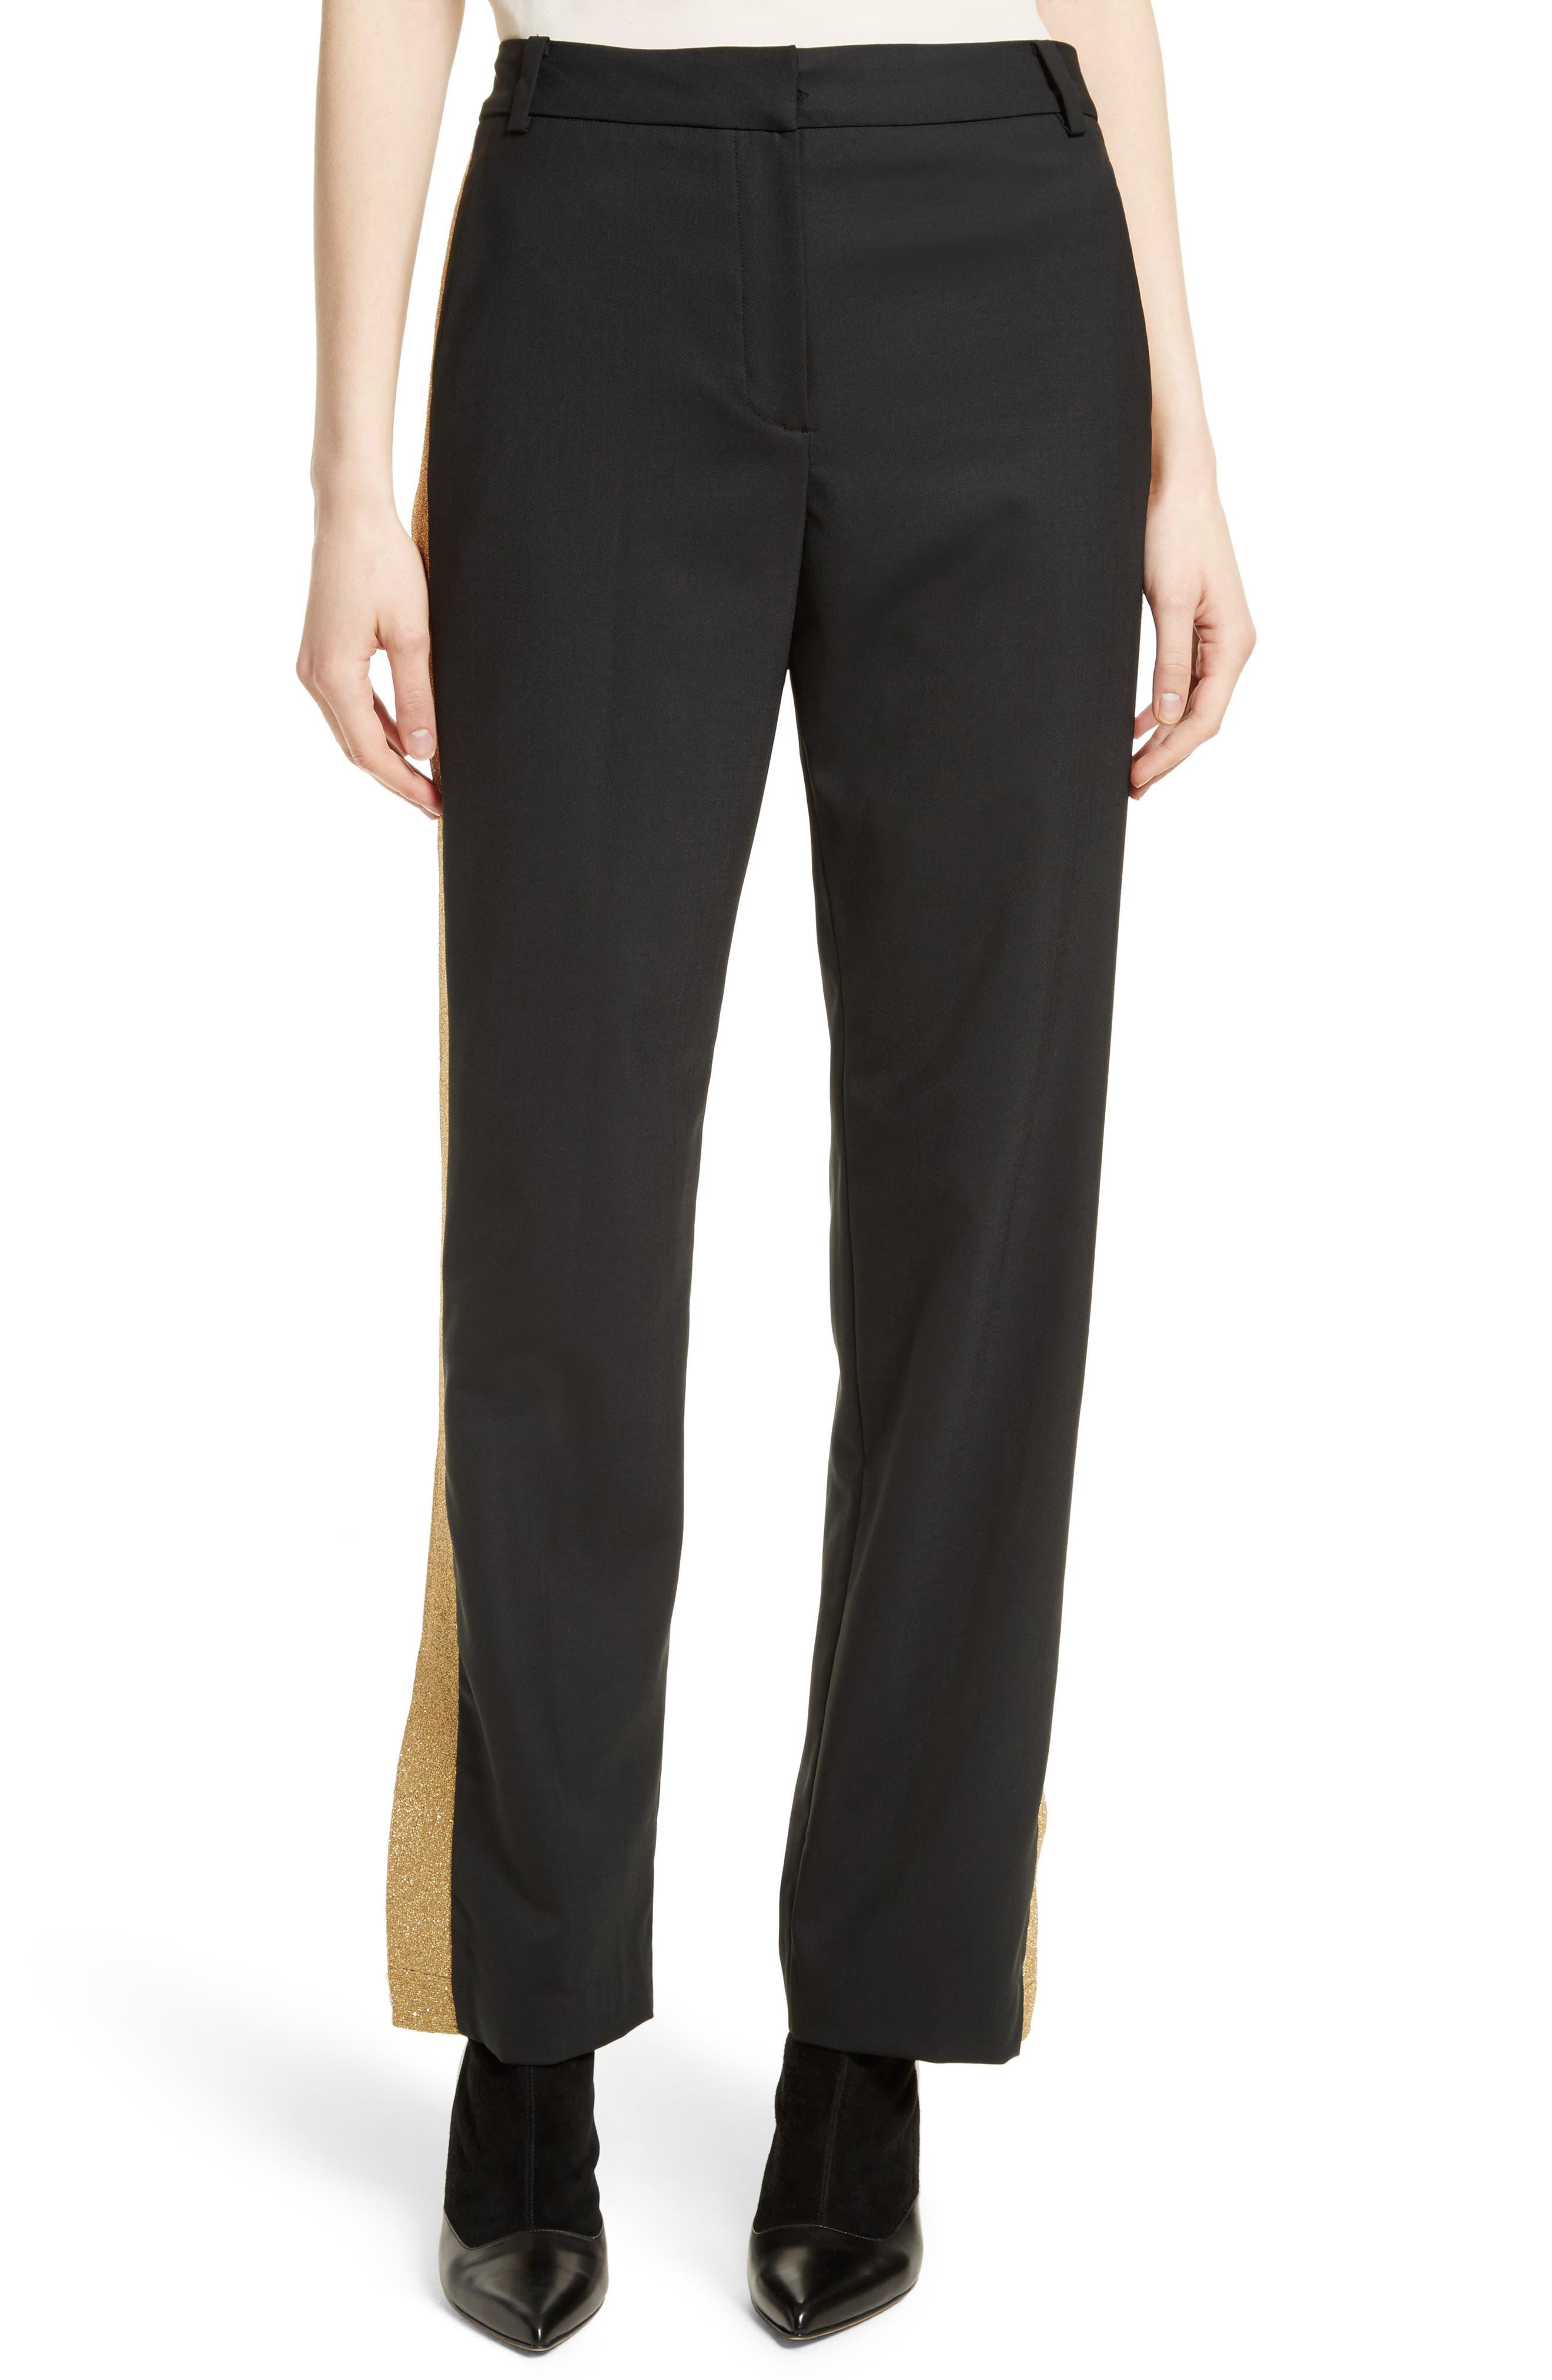 Alternate Image 1 Selected - Tibi Tropical Blend Tuxedo Pants